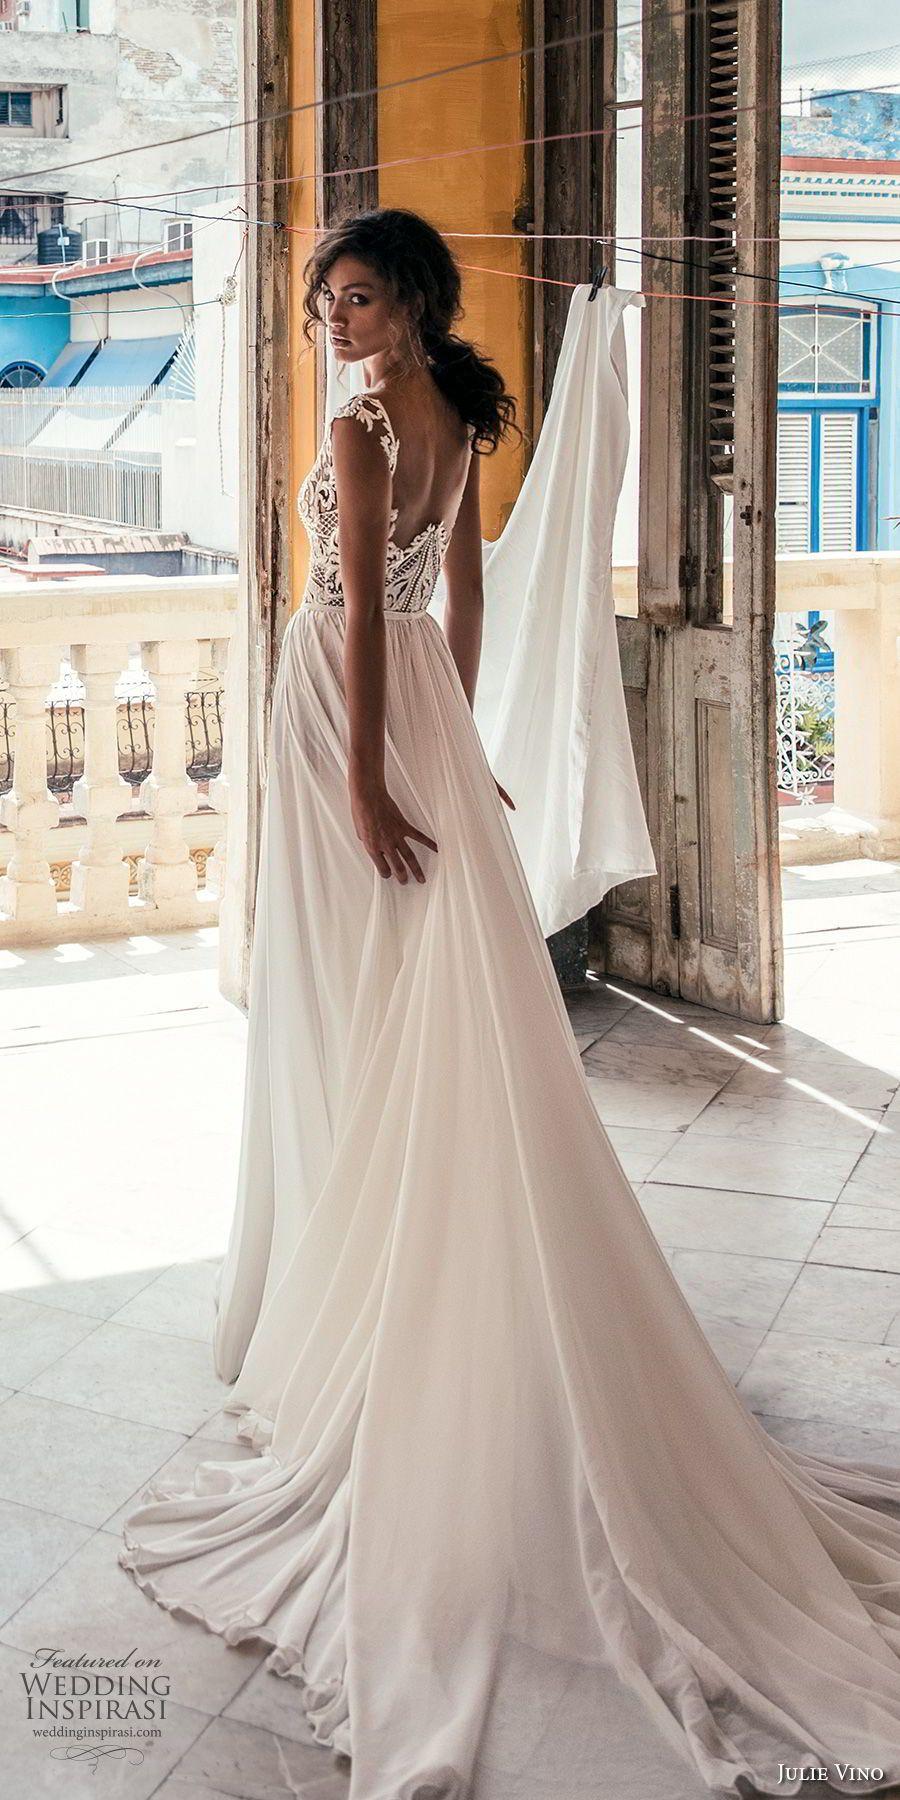 High neck wedding dresses  Julie Vino Fall  Wedding Dresses u ucHavanaud Bridal Collection